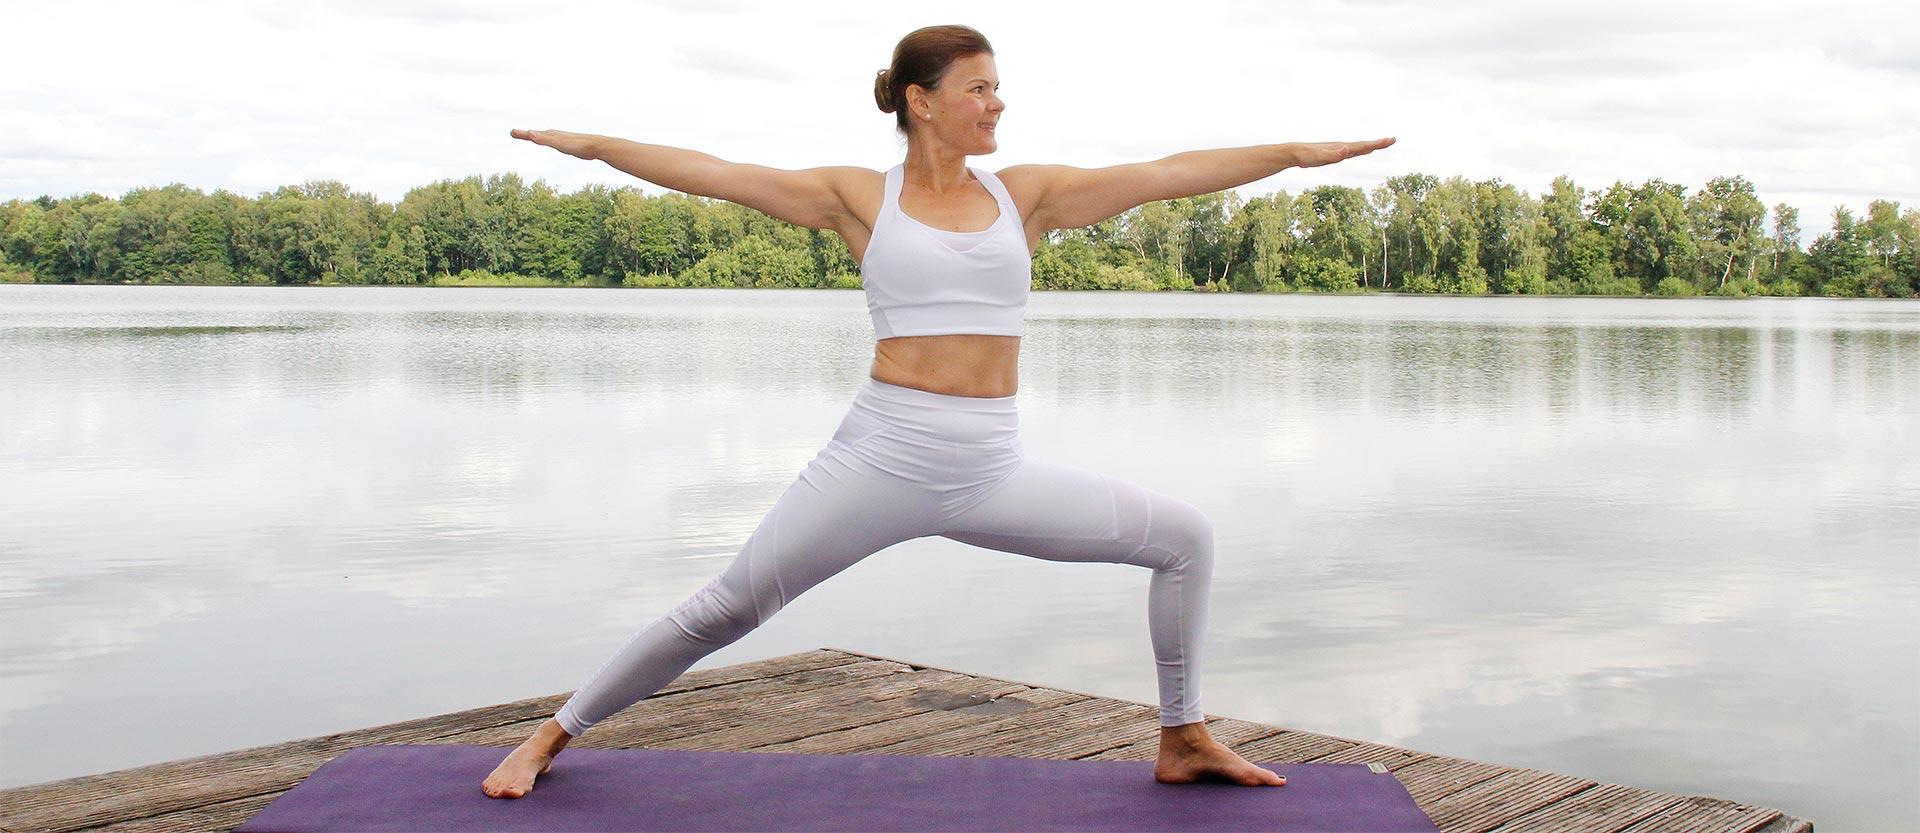 Yoga in Winsen Kurse Heroshot